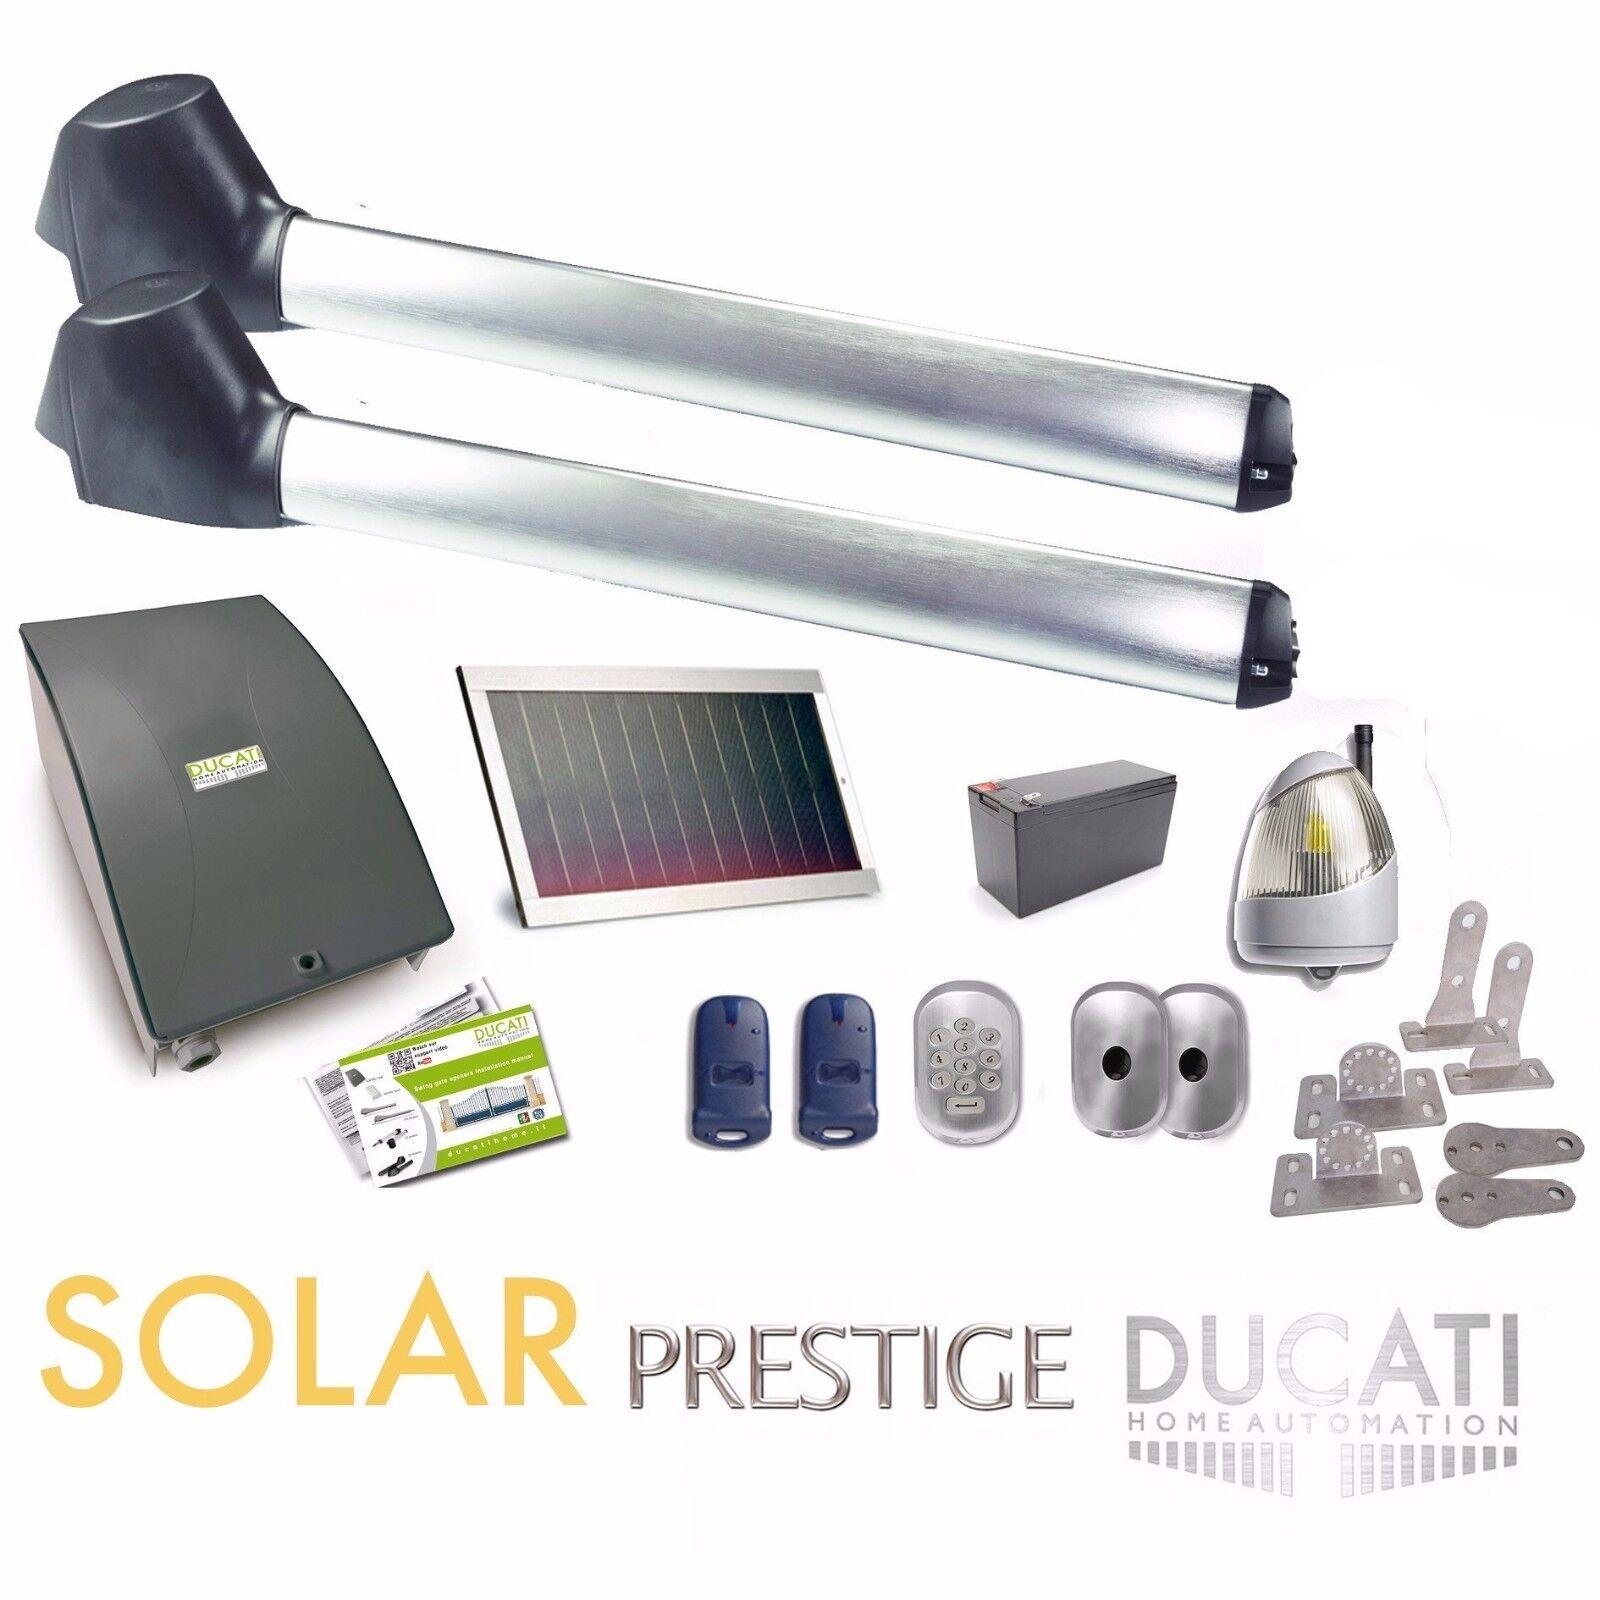 SWING GATE OPENER DUCATI EVO748 SOLAR 100% autonomous powered by solar panel